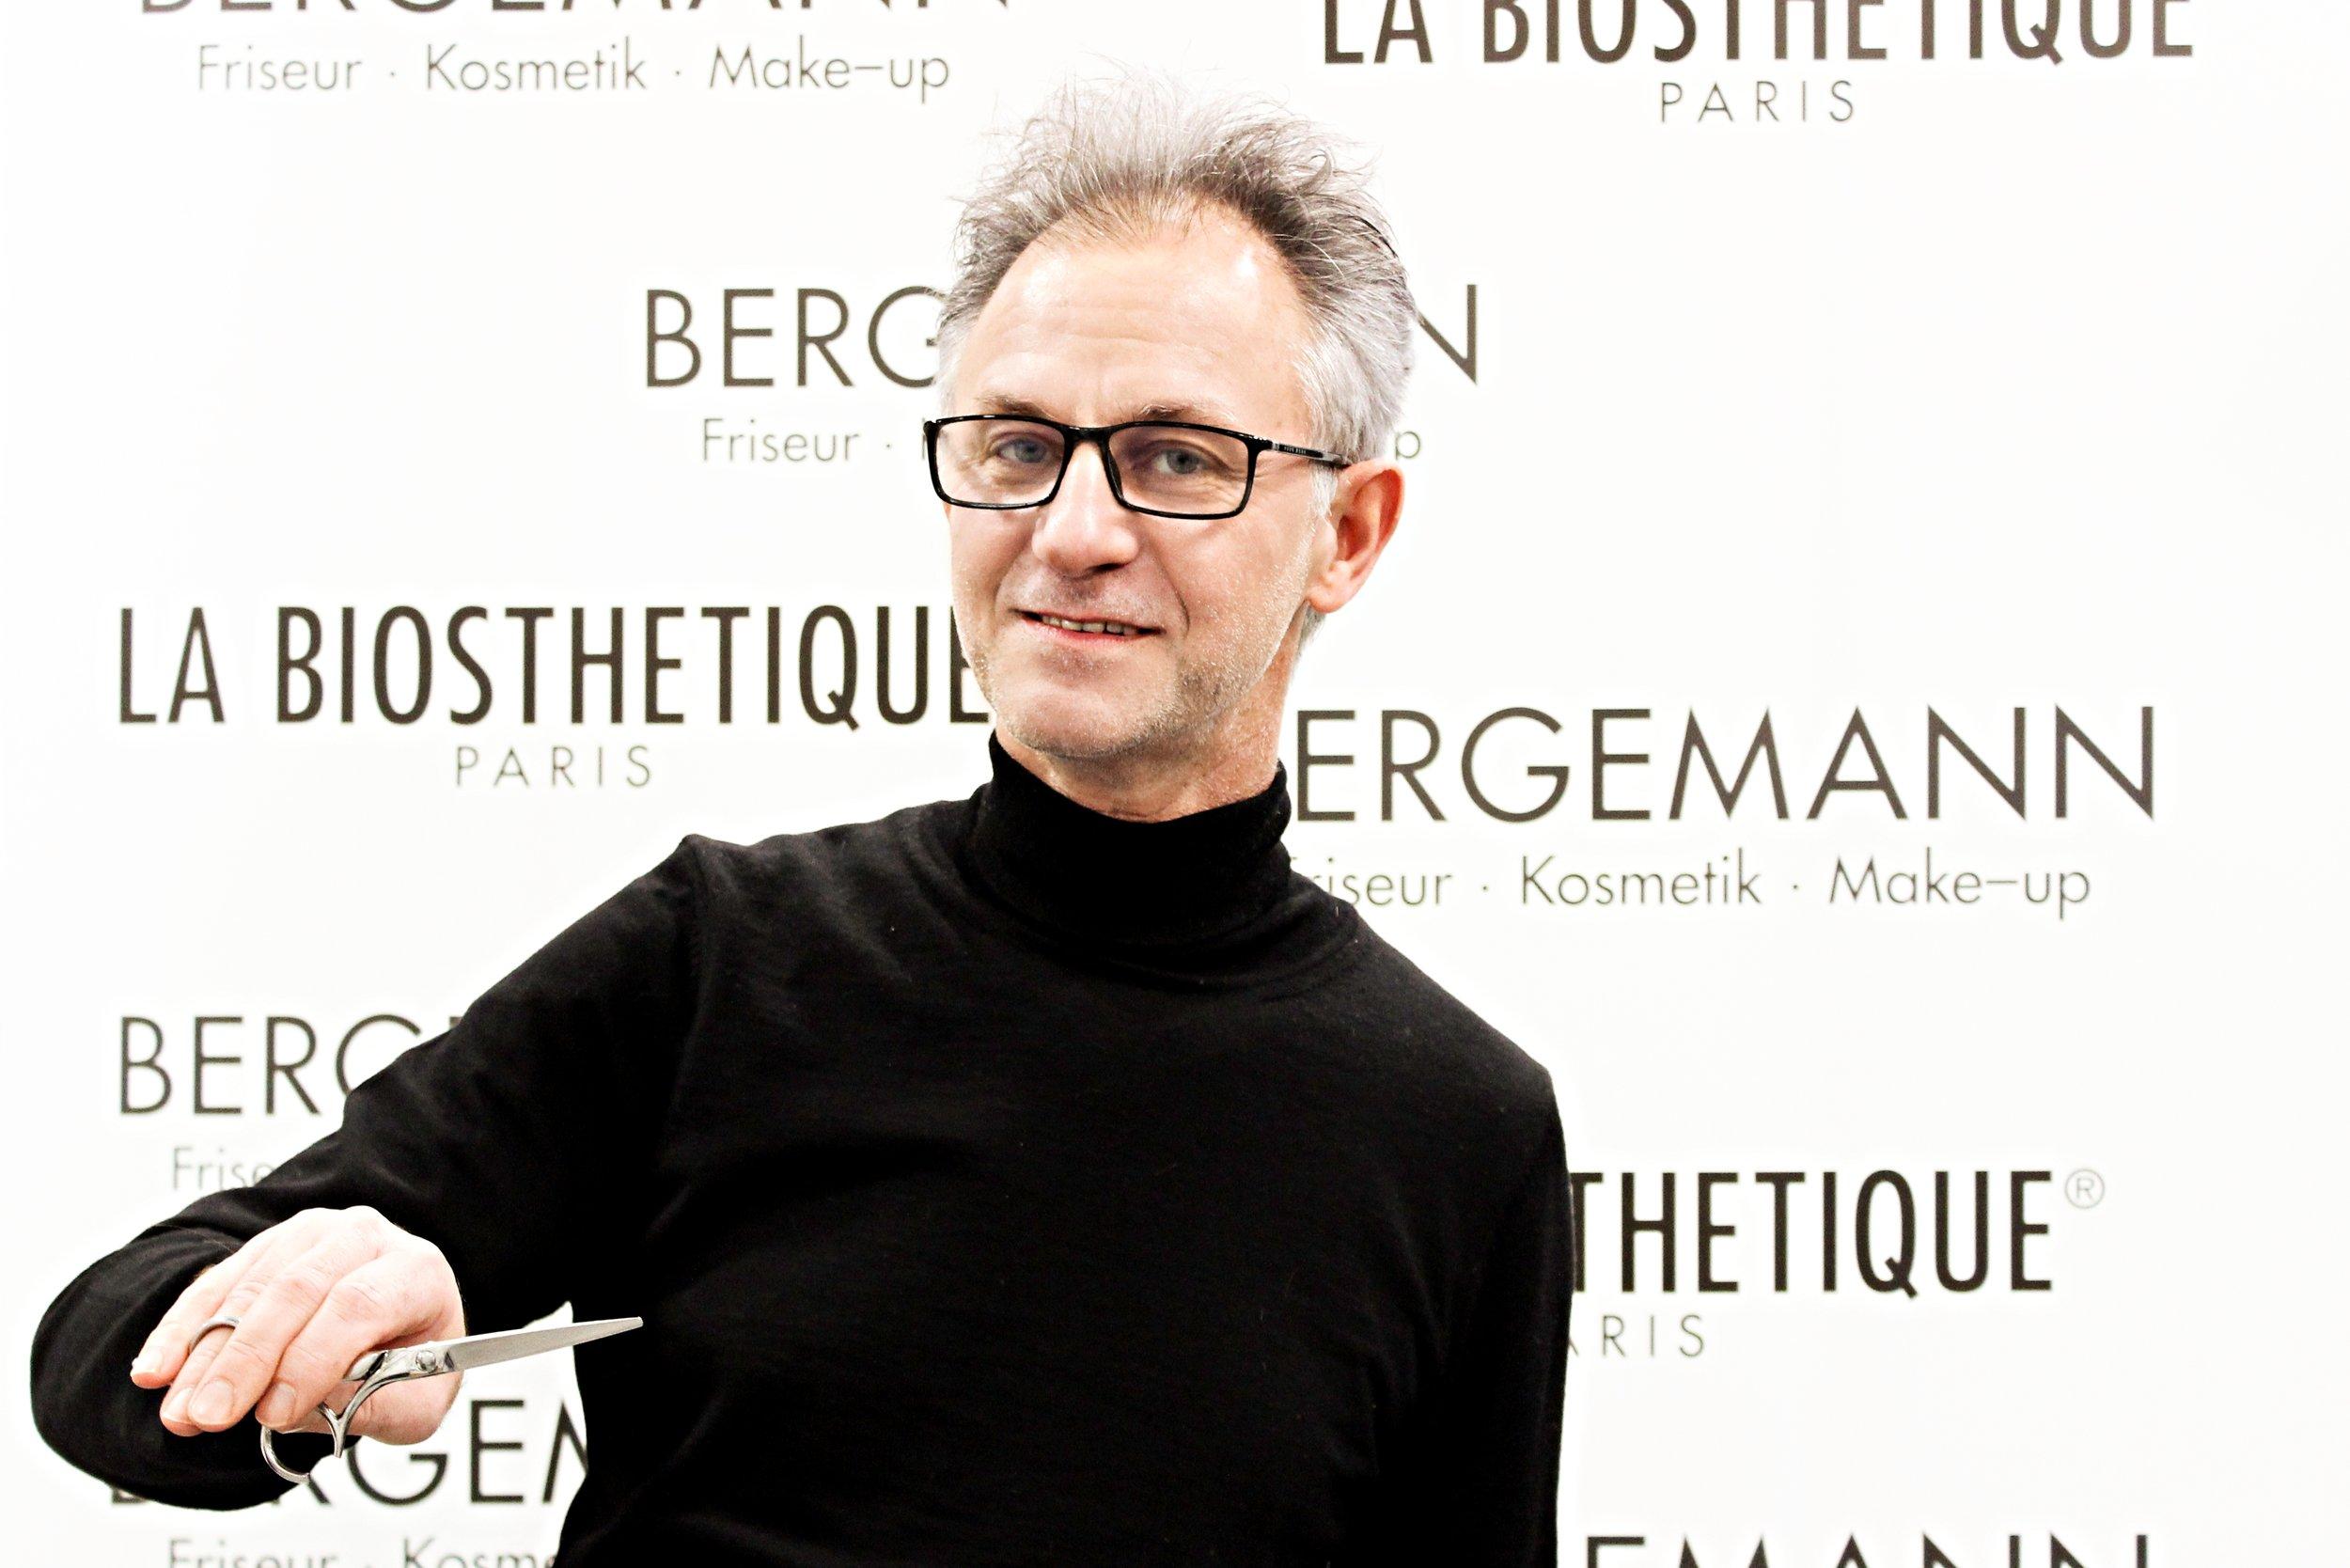 Thomas - Inhaber - Friseur - Betriebswirt